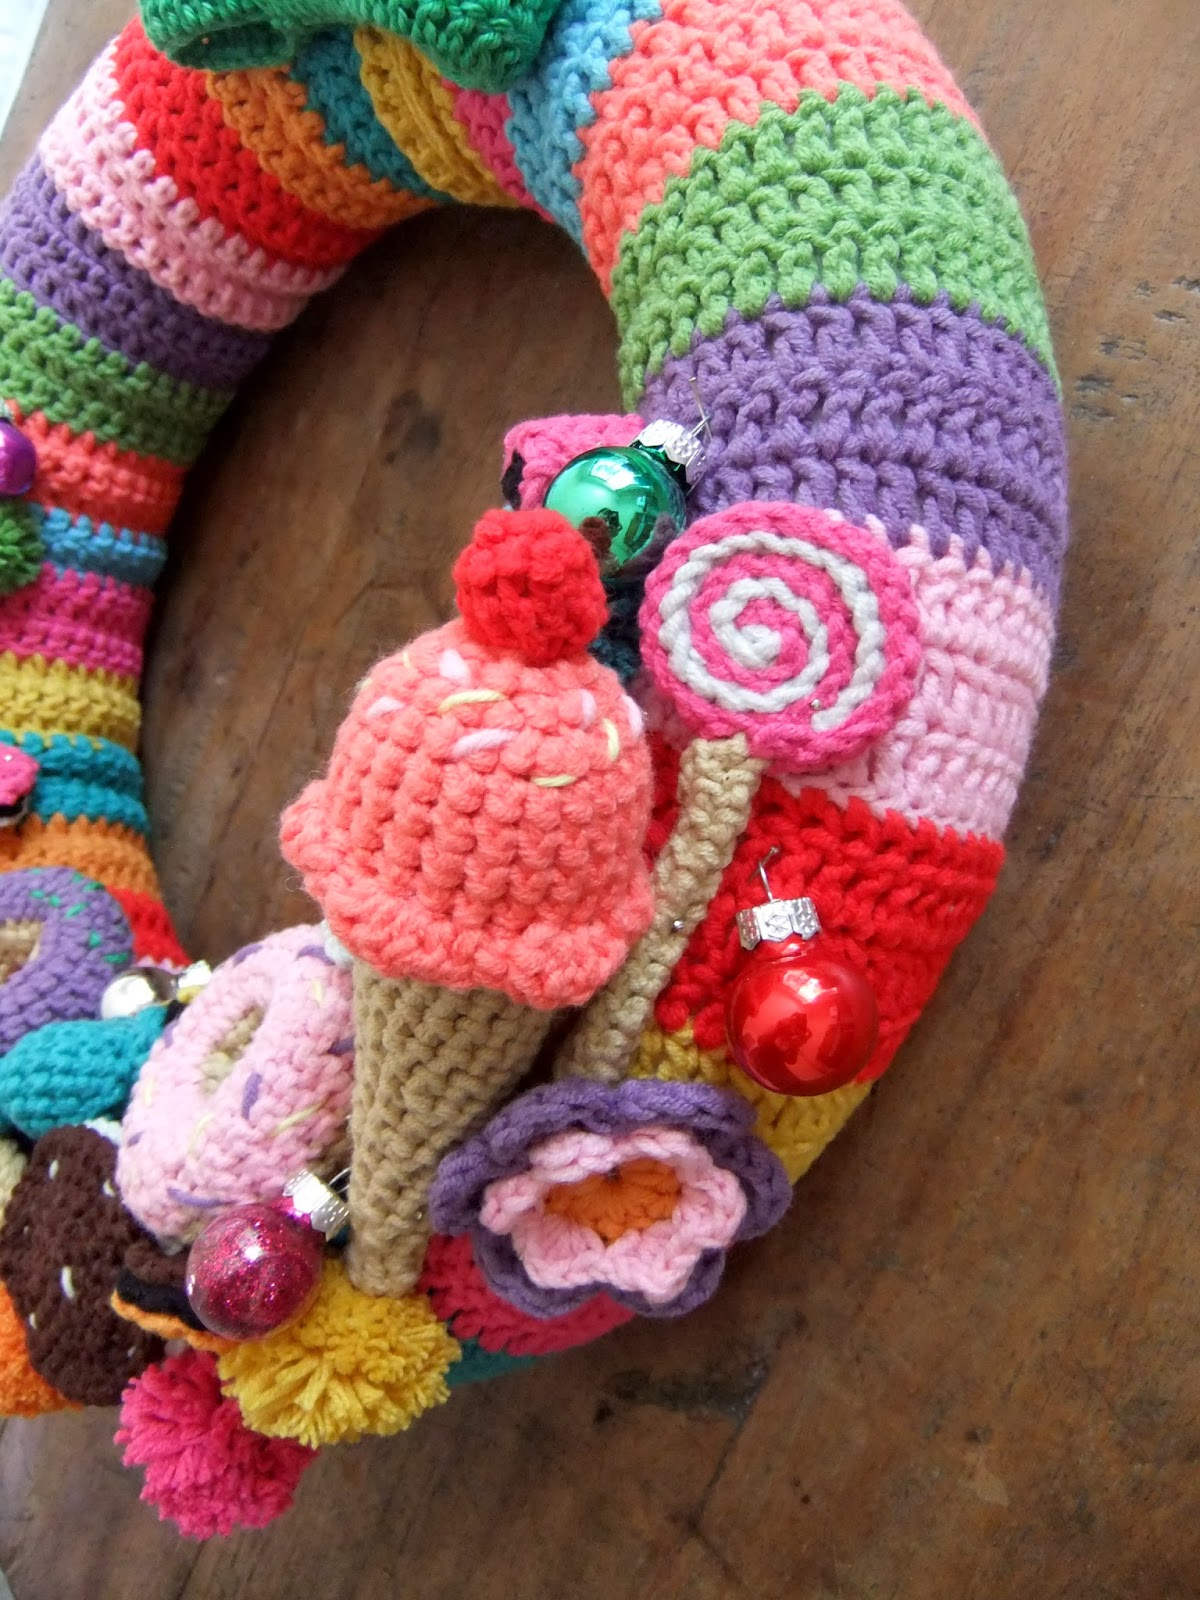 Crochet Pattern For Xmas Wreath : I Love Buttons By Emma: Crochet Christmas Wreath